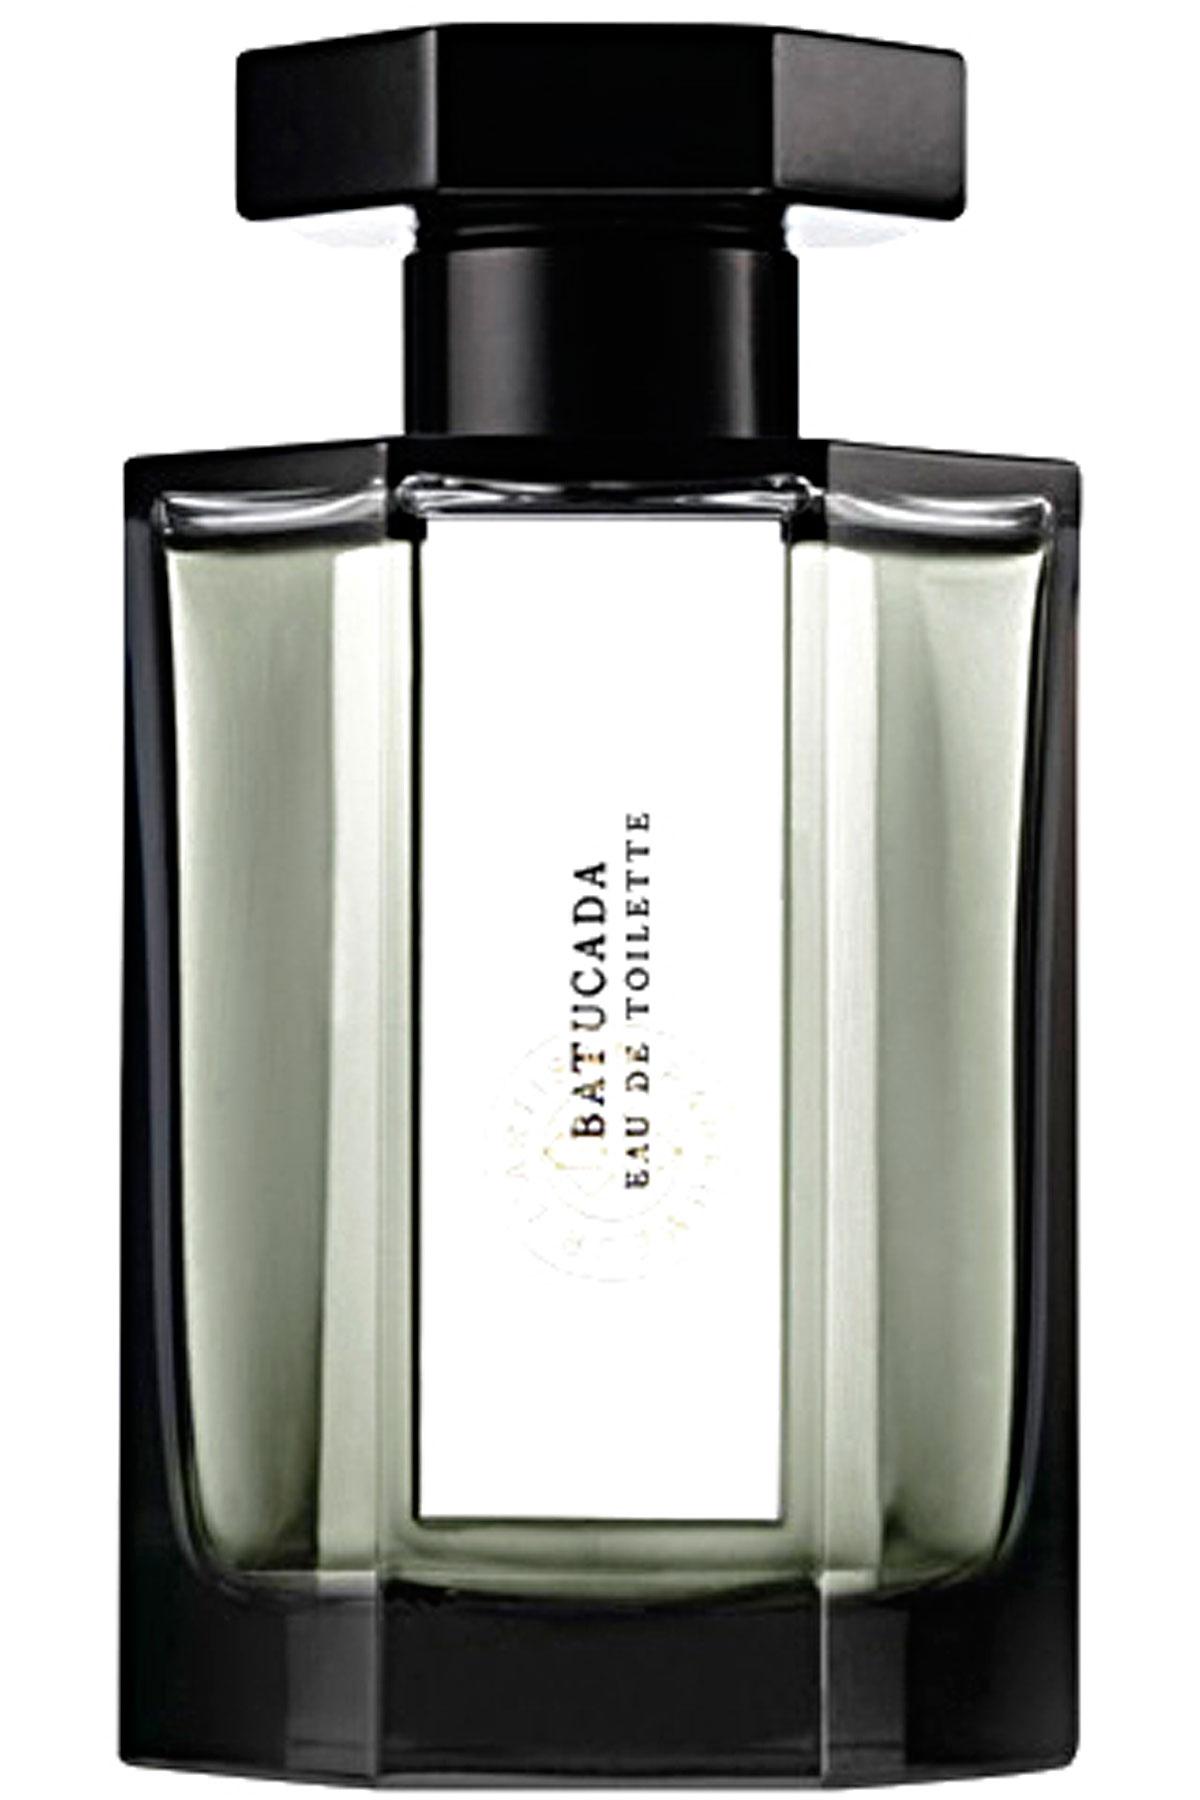 Artisan Parfumeur Fragrances for Men, Batucada - Eau De Toilette - 100 Ml, 2019, 100 ml